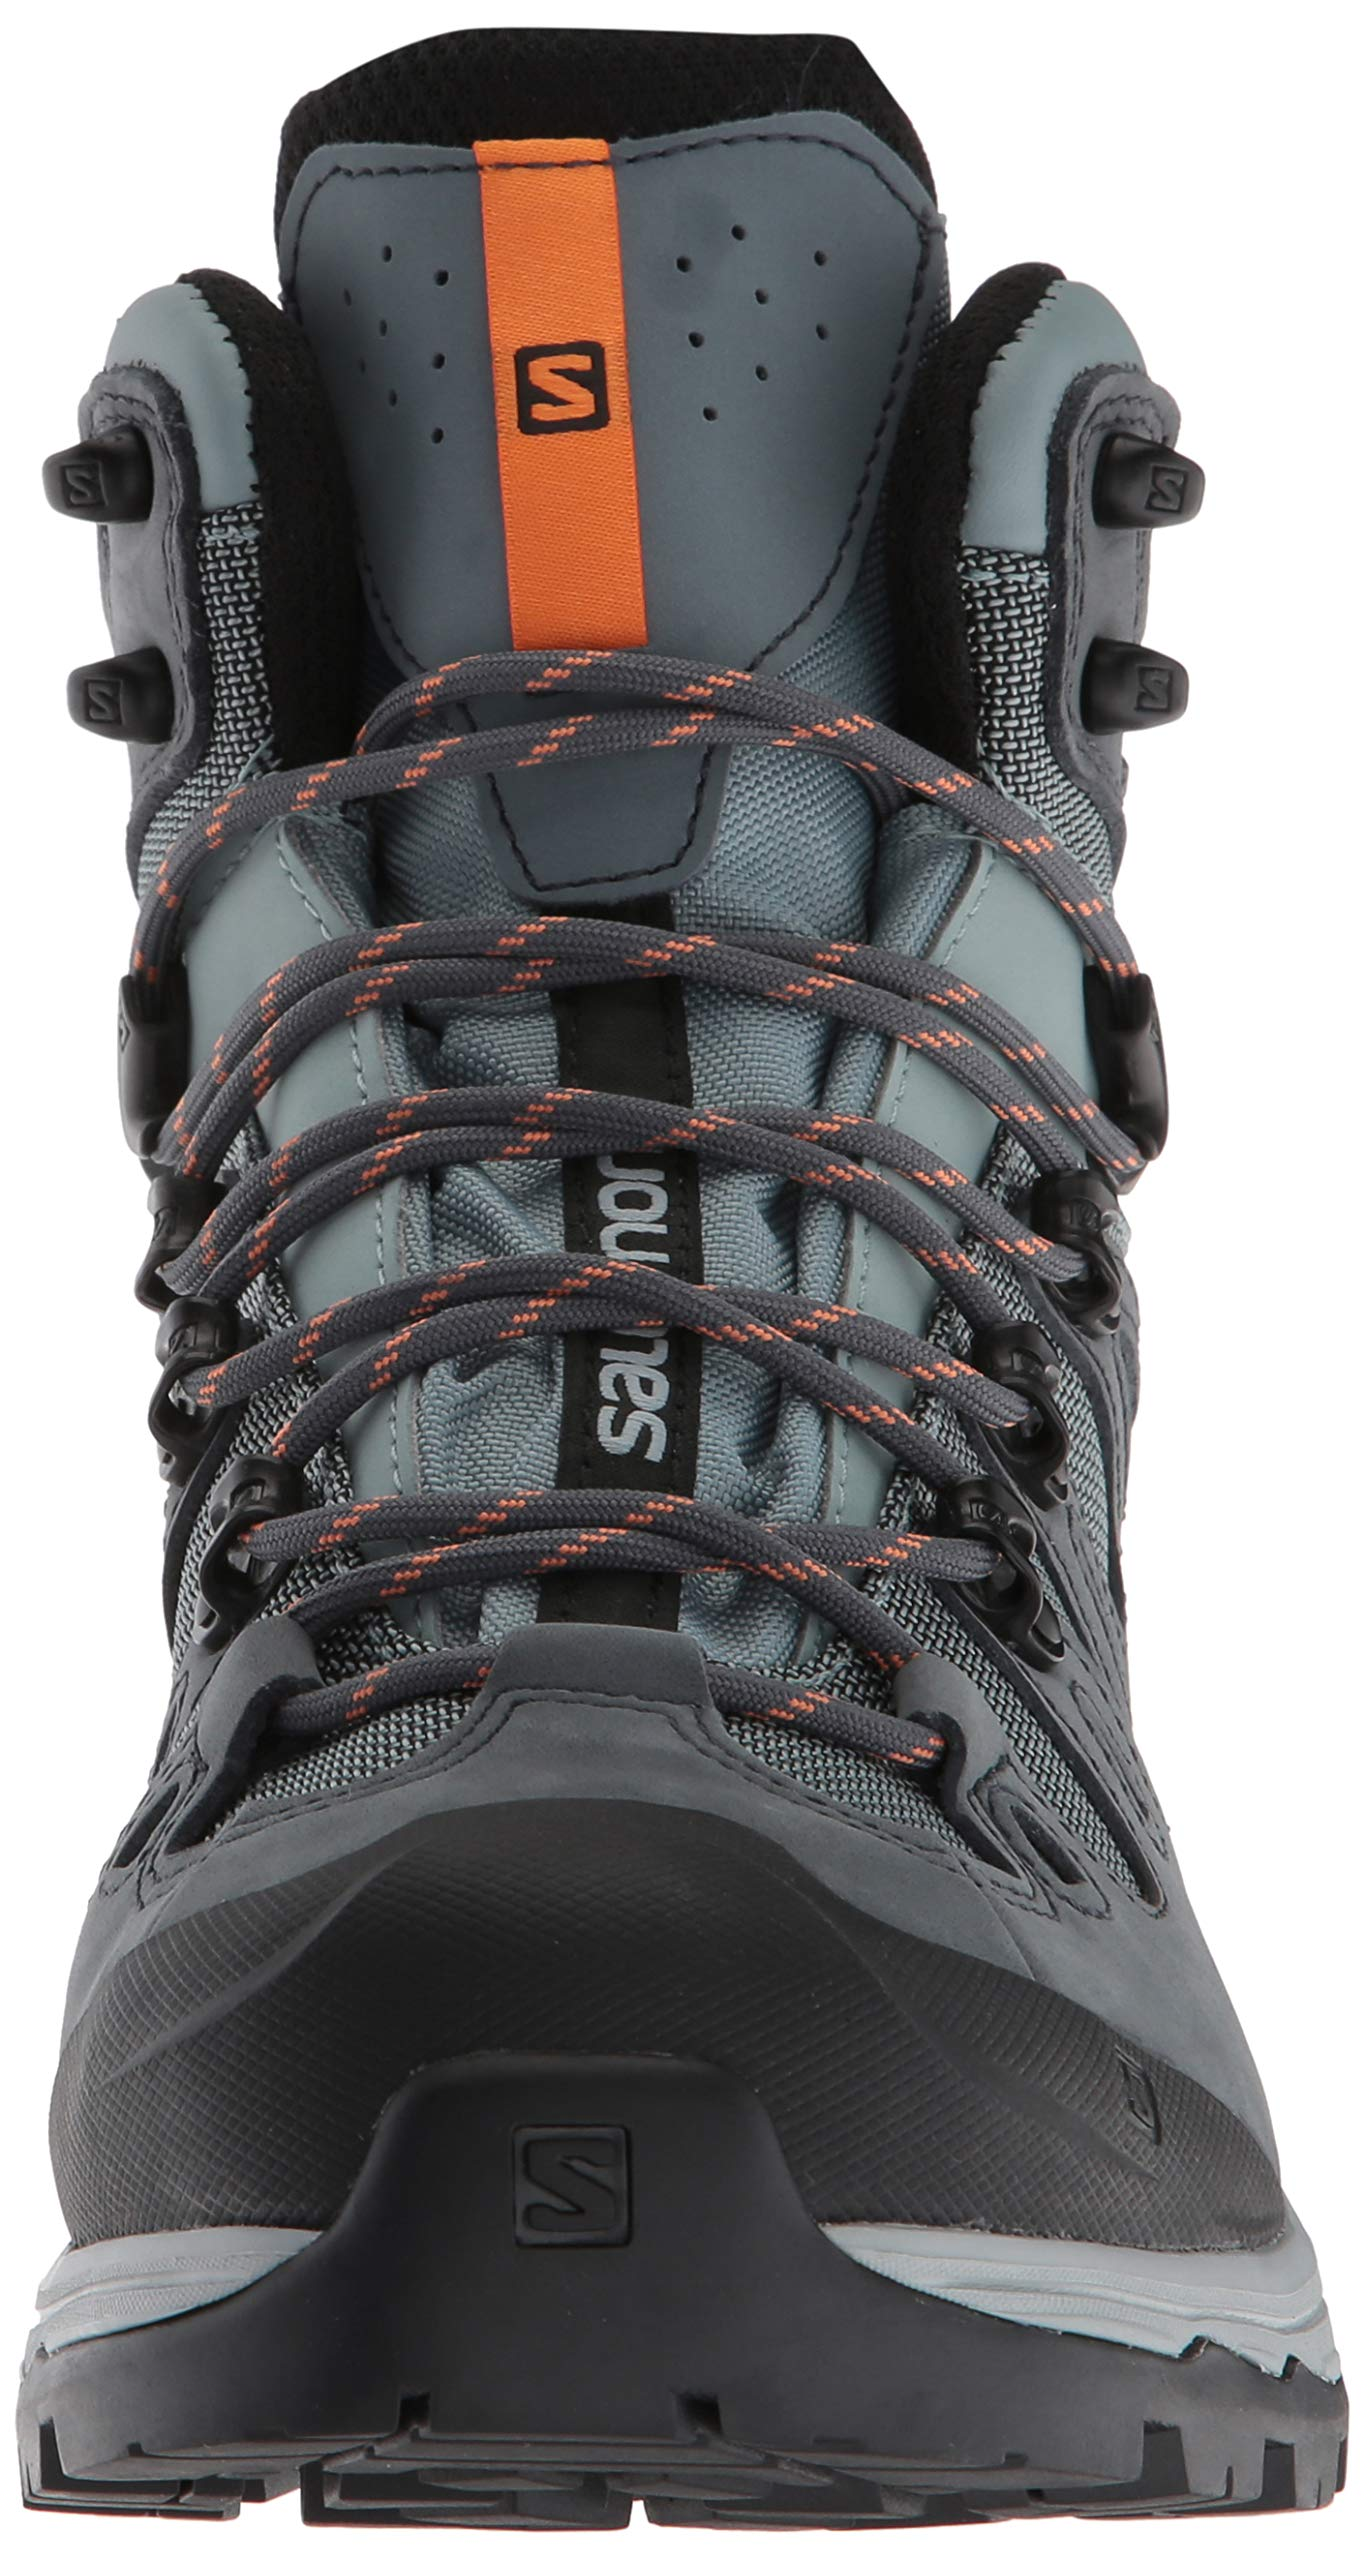 SALOMON Women's Quest 4d 3 GTX W High Rise Hiking Boots 4